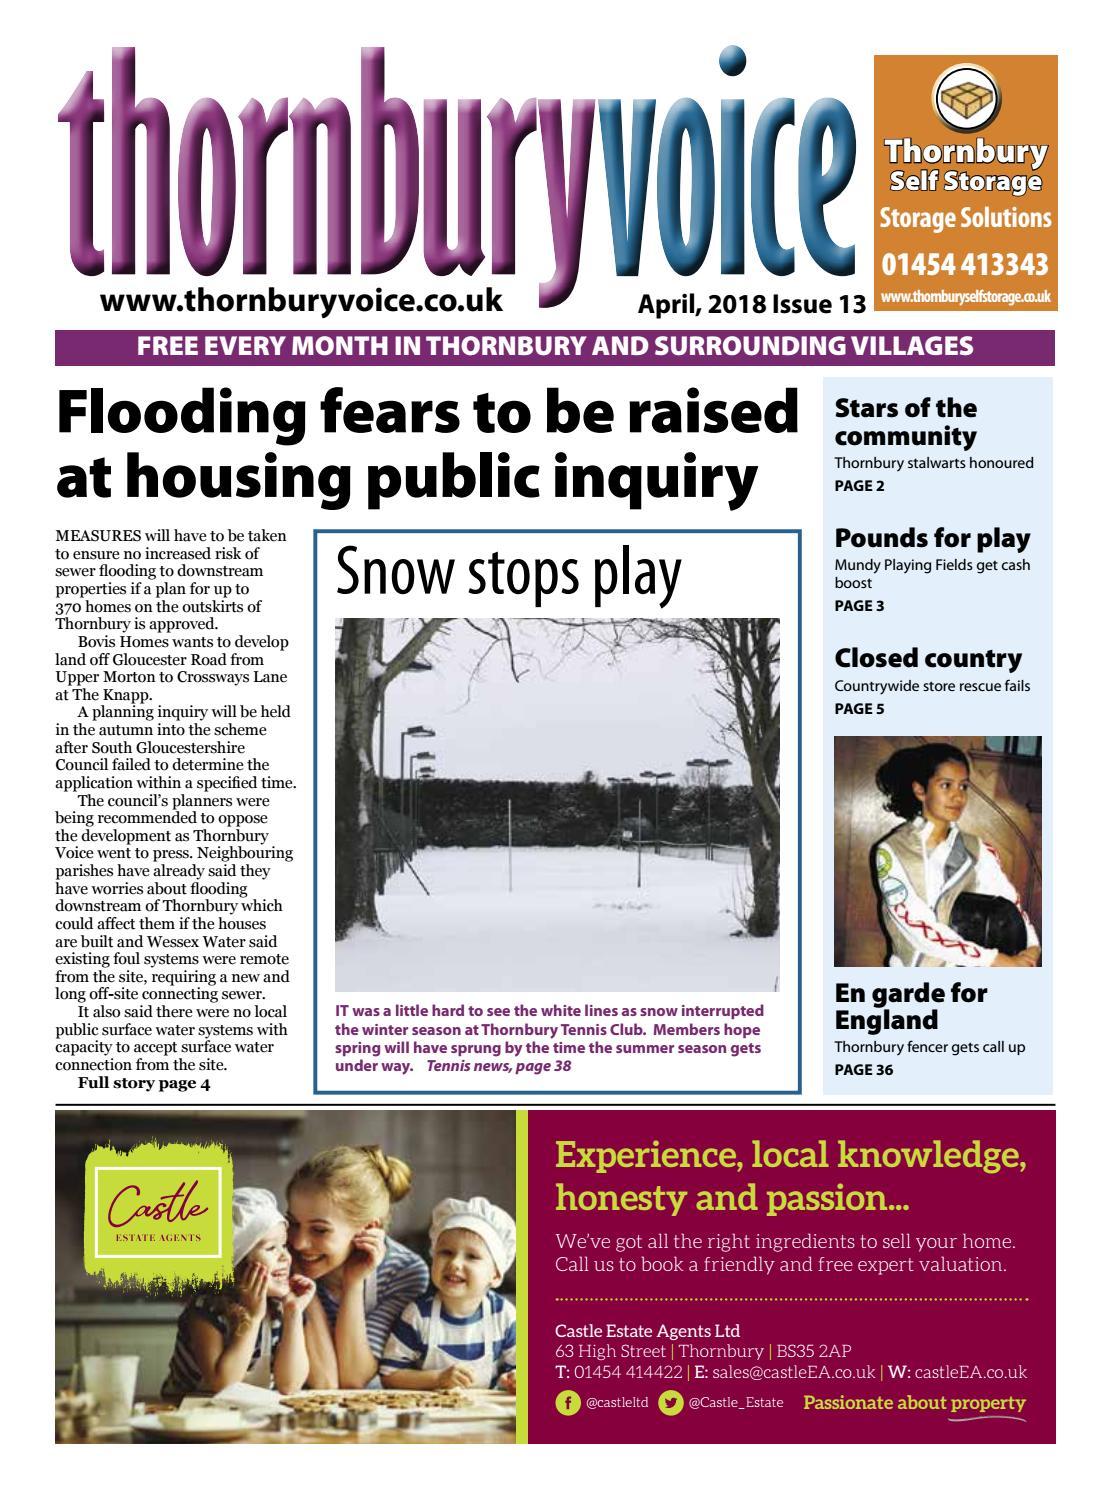 a2da21a0370 Thornbury Voice April 2018 by Thornbury Voice - issuu